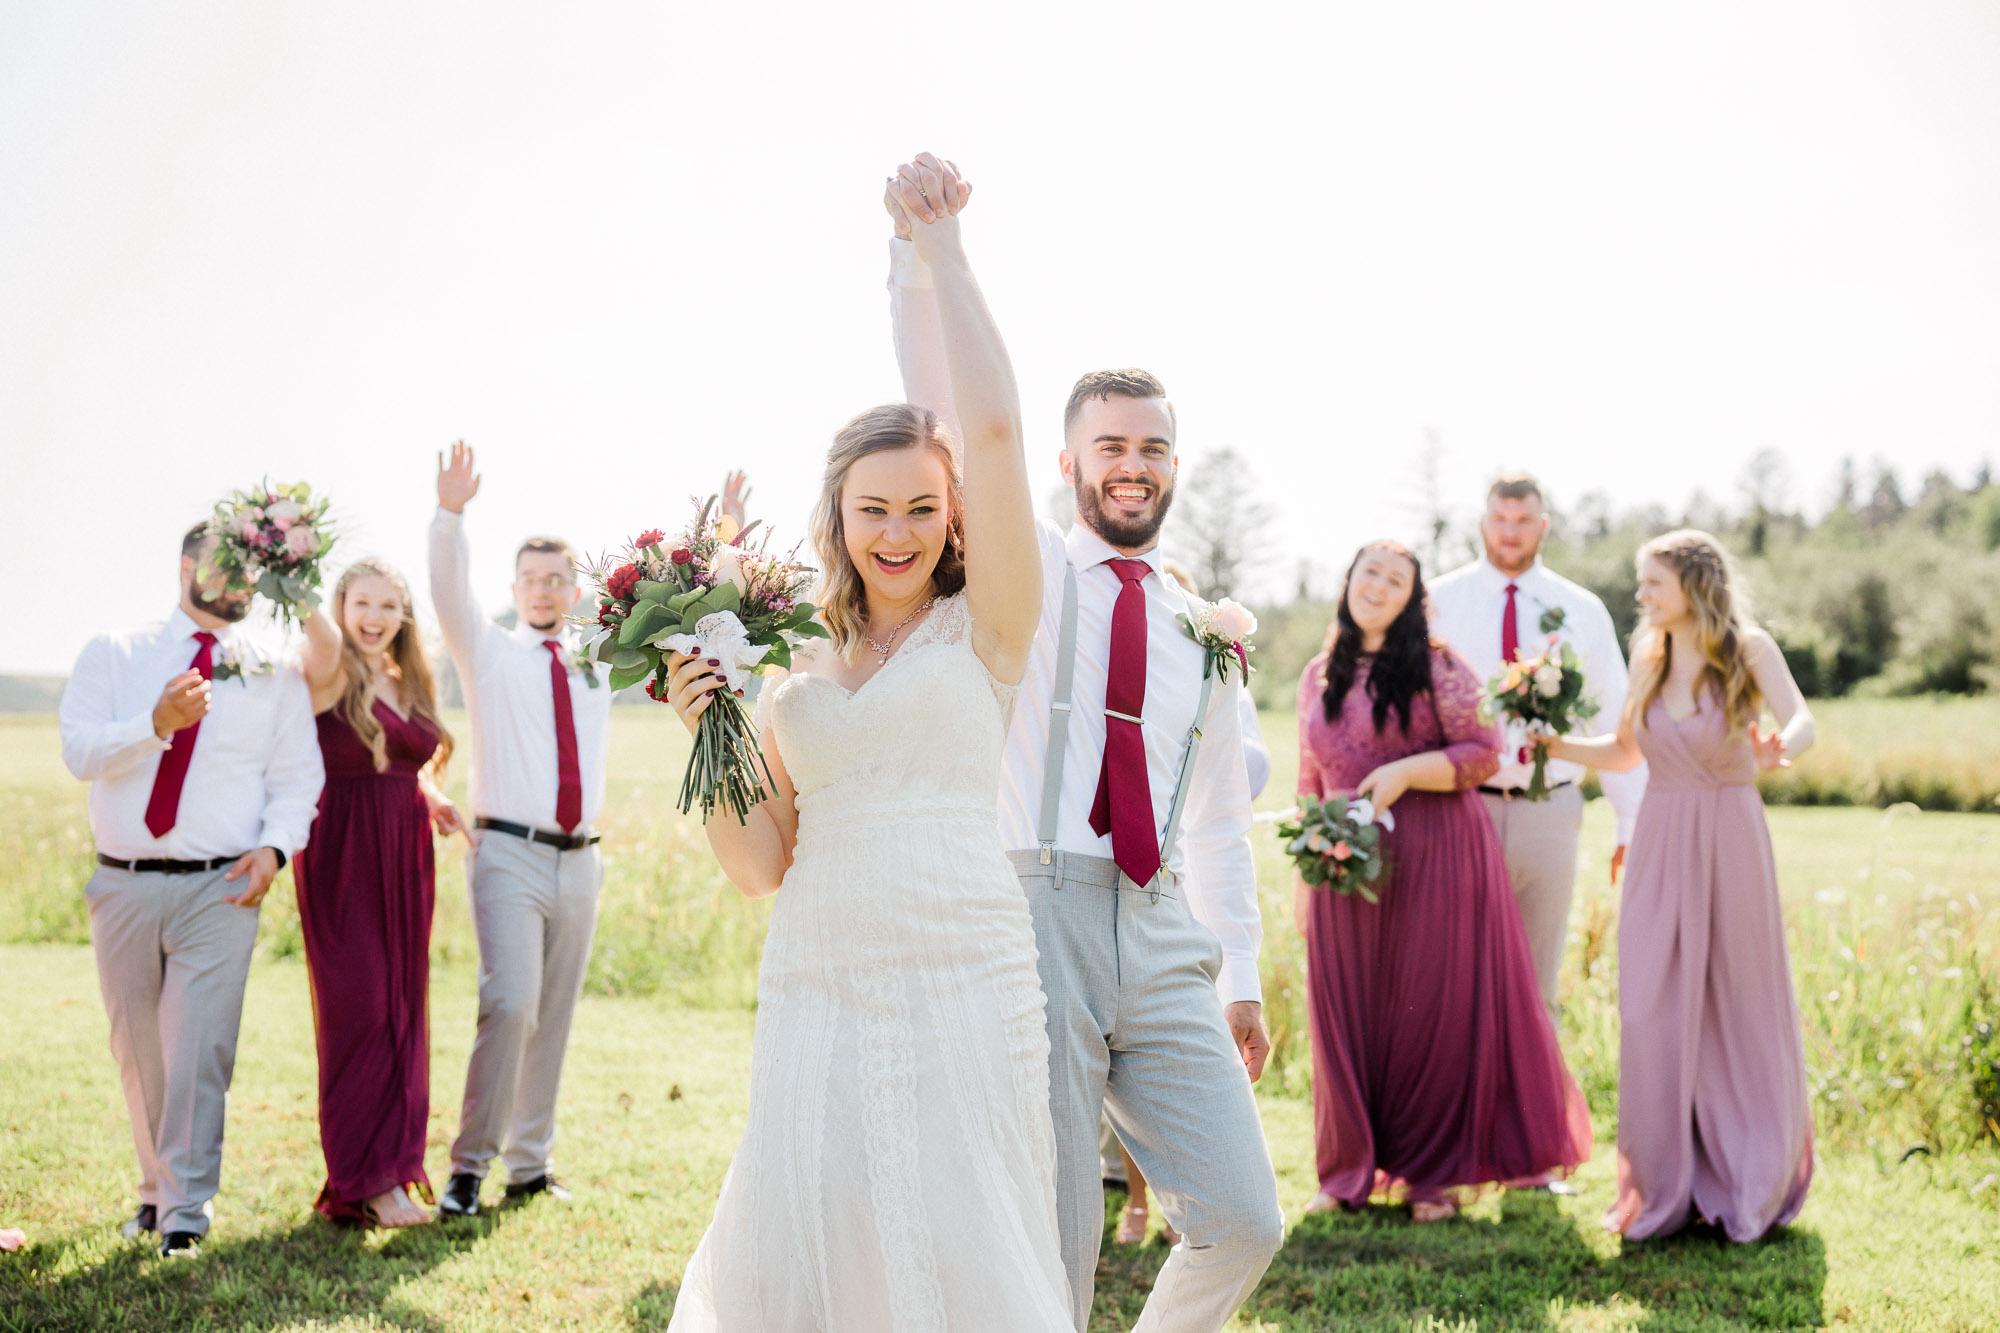 Stillwater-Christian_Church_Wedding-1844.jpg